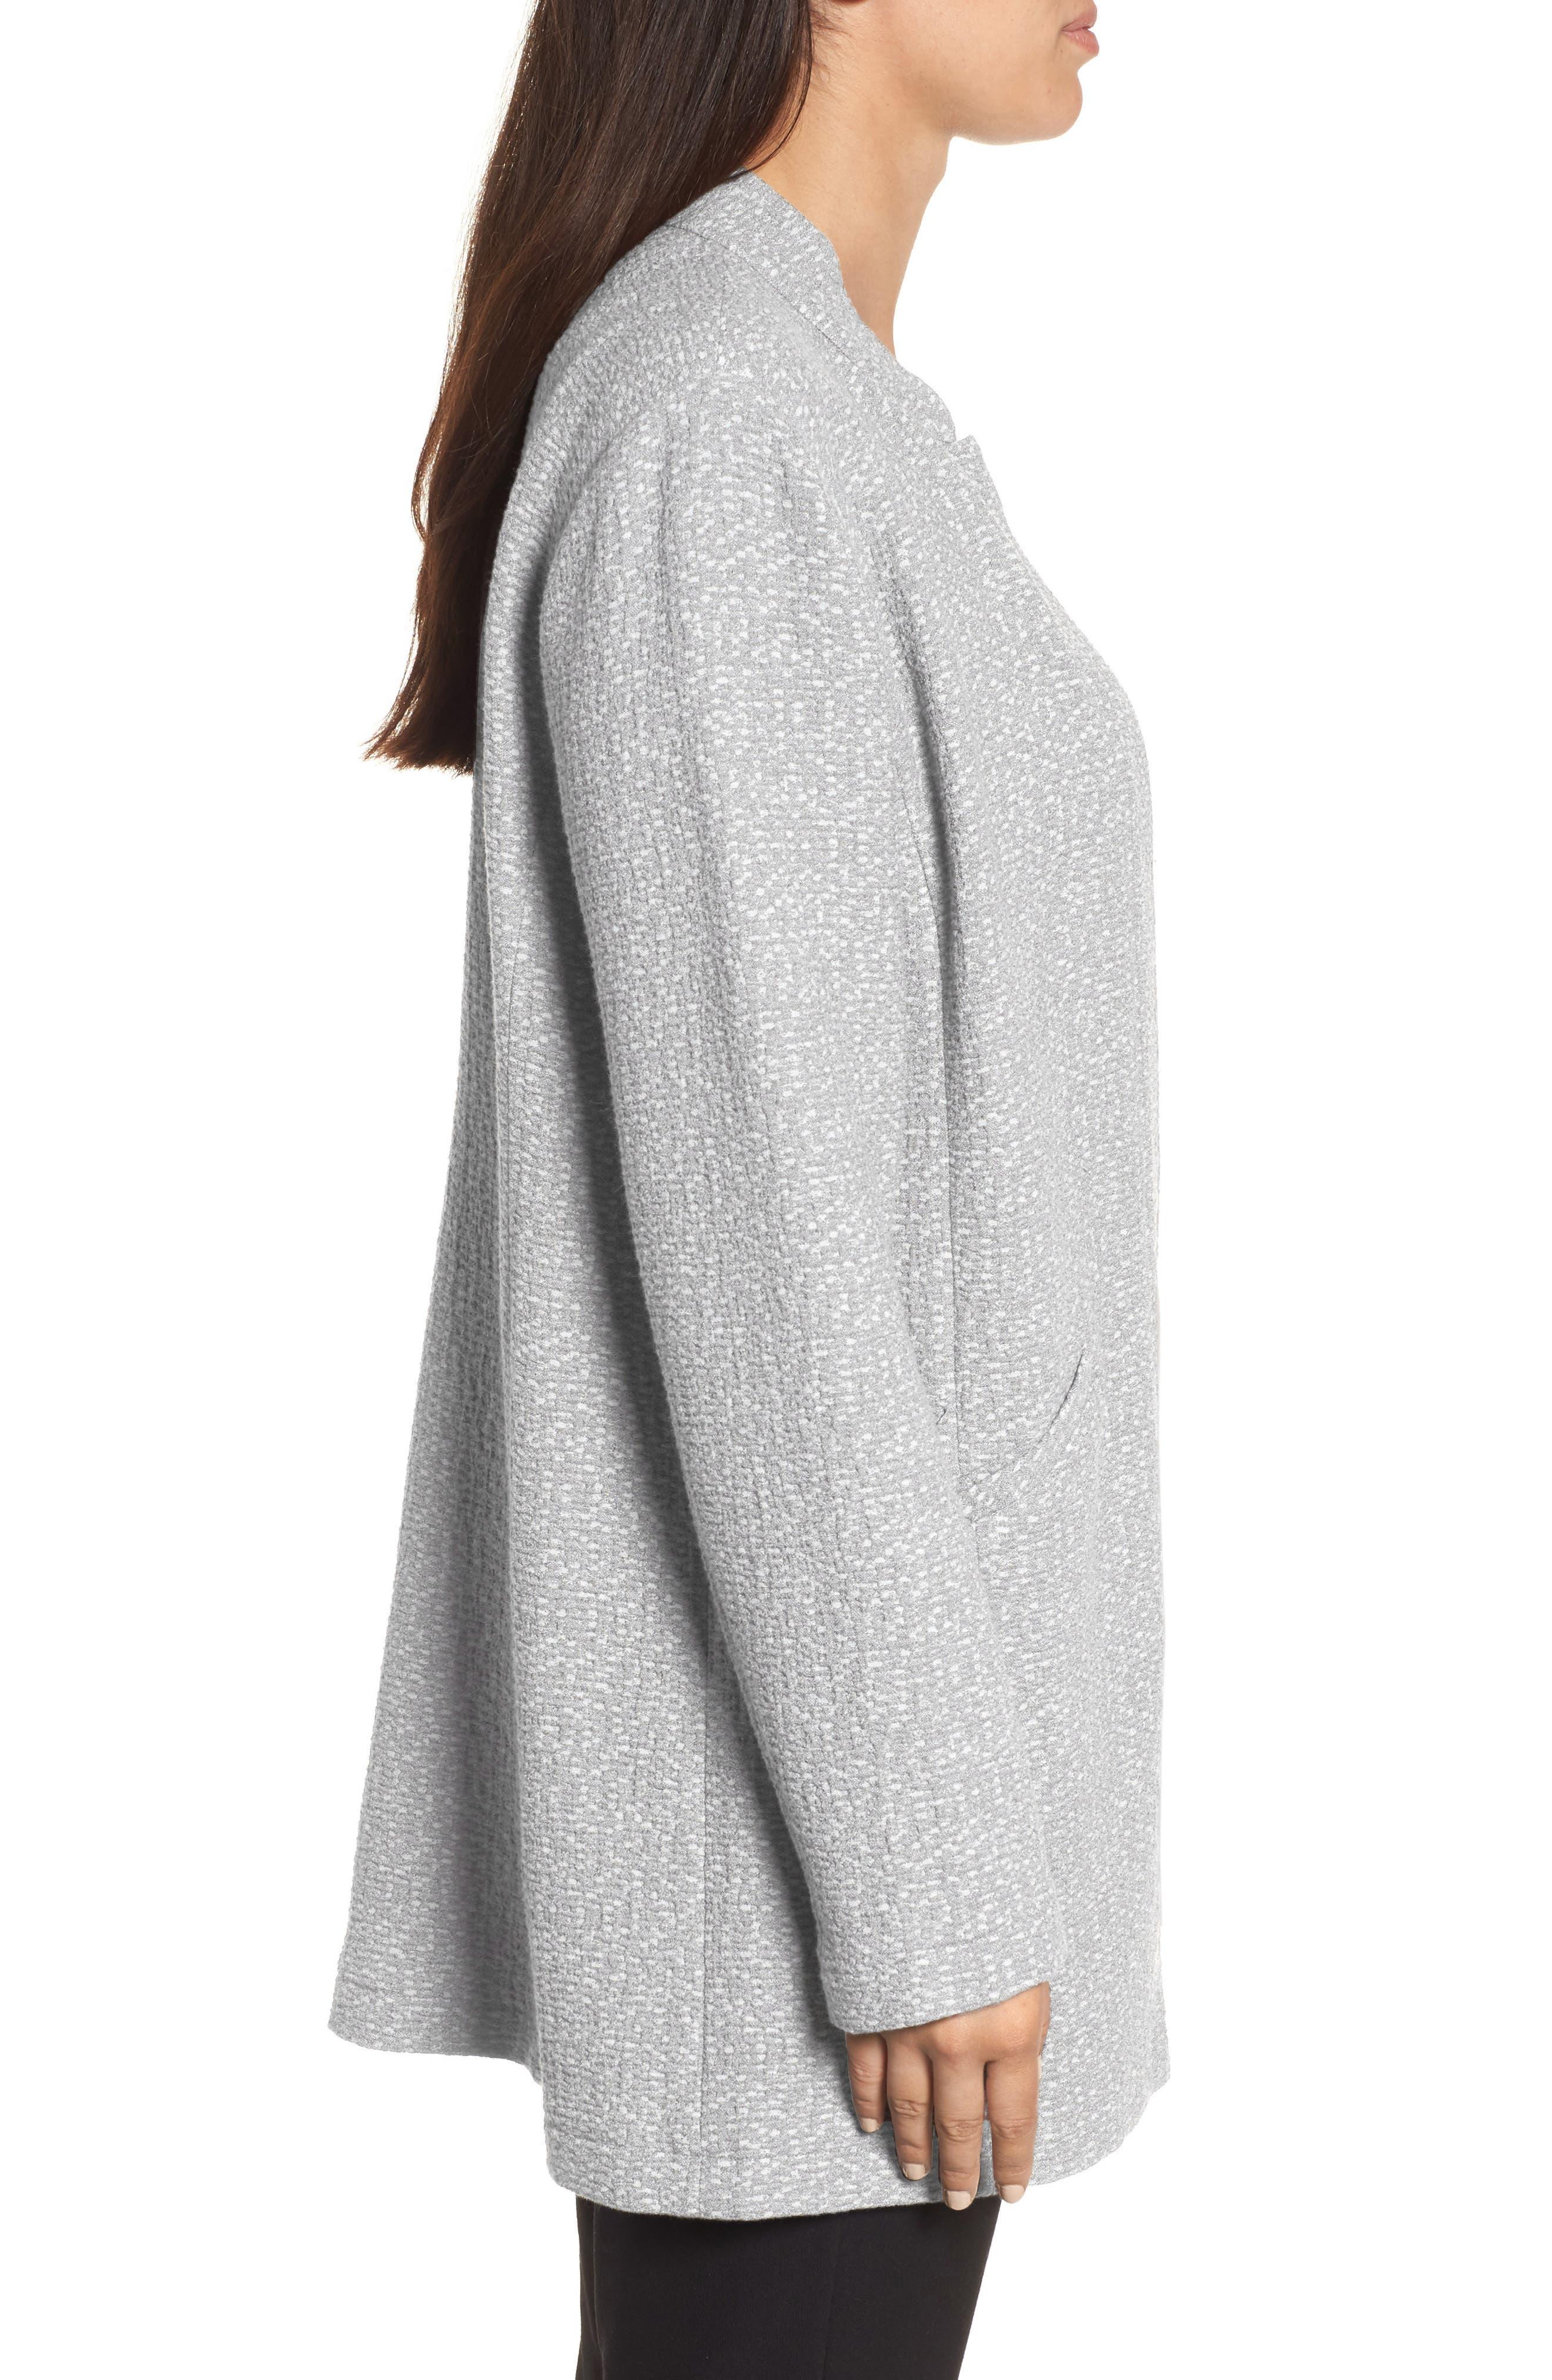 Tweed Jacket,                             Alternate thumbnail 3, color,                             022